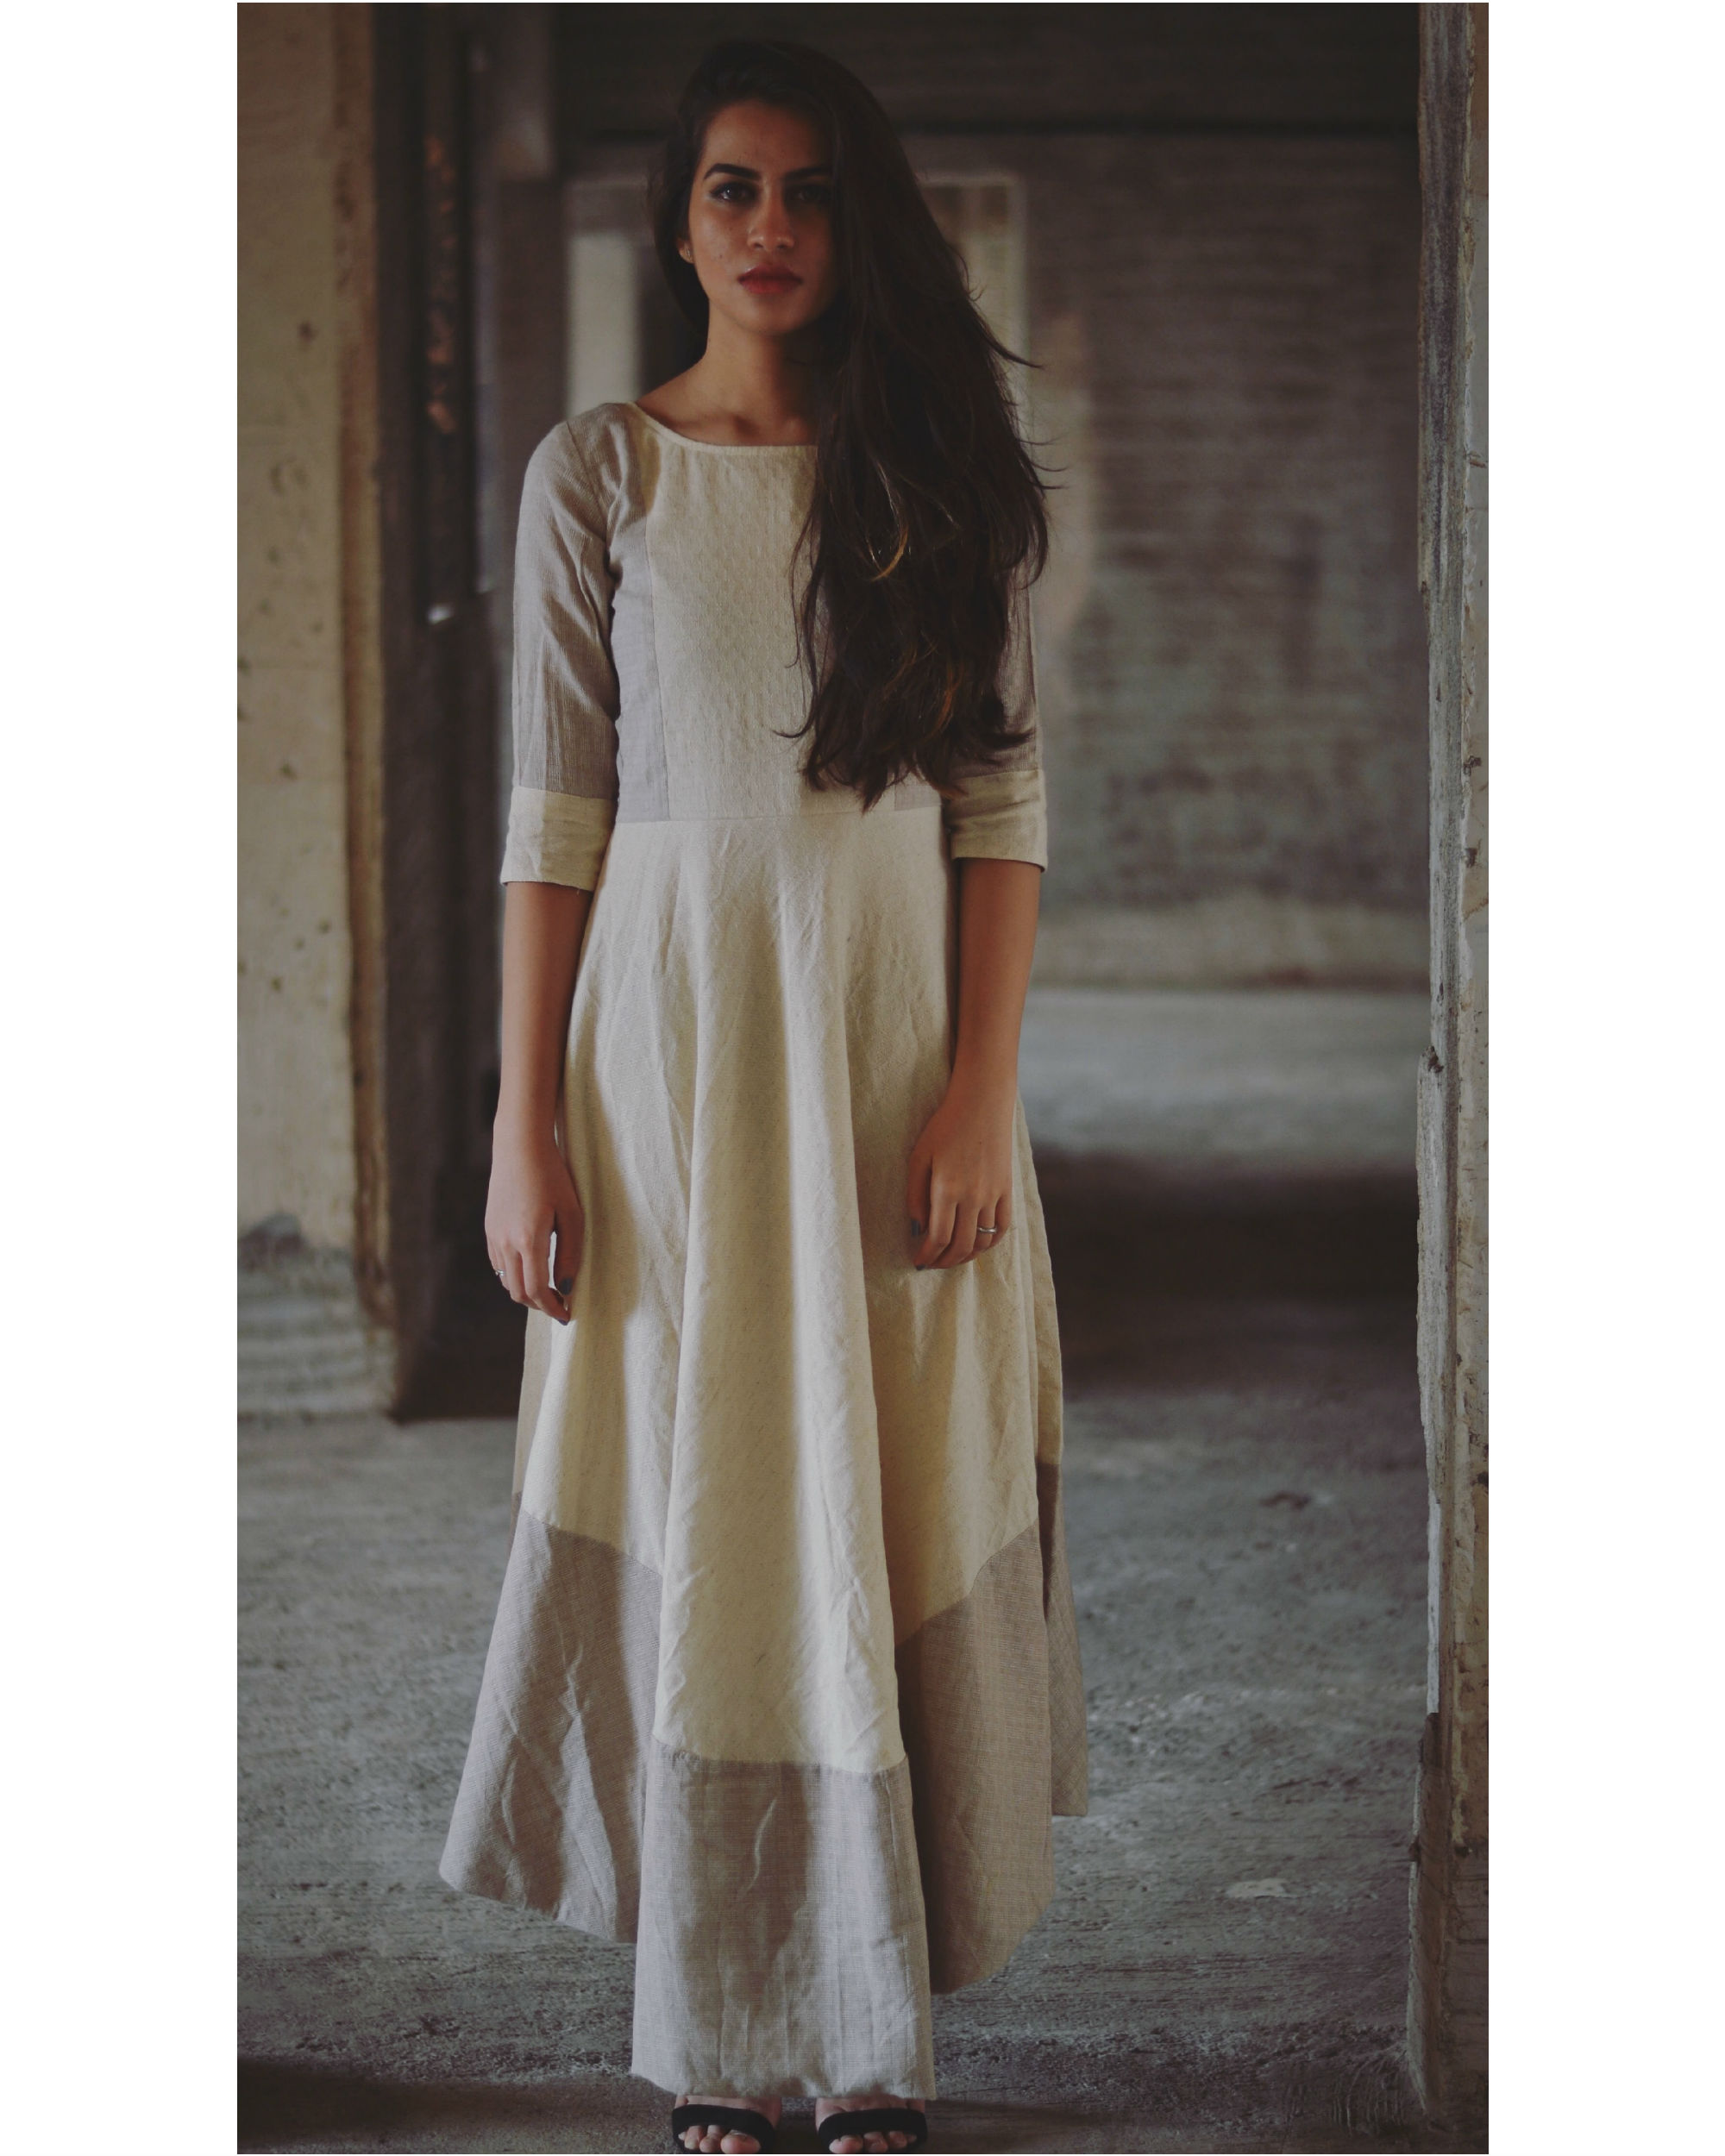 Pearl grey and beige asymmetrical dress